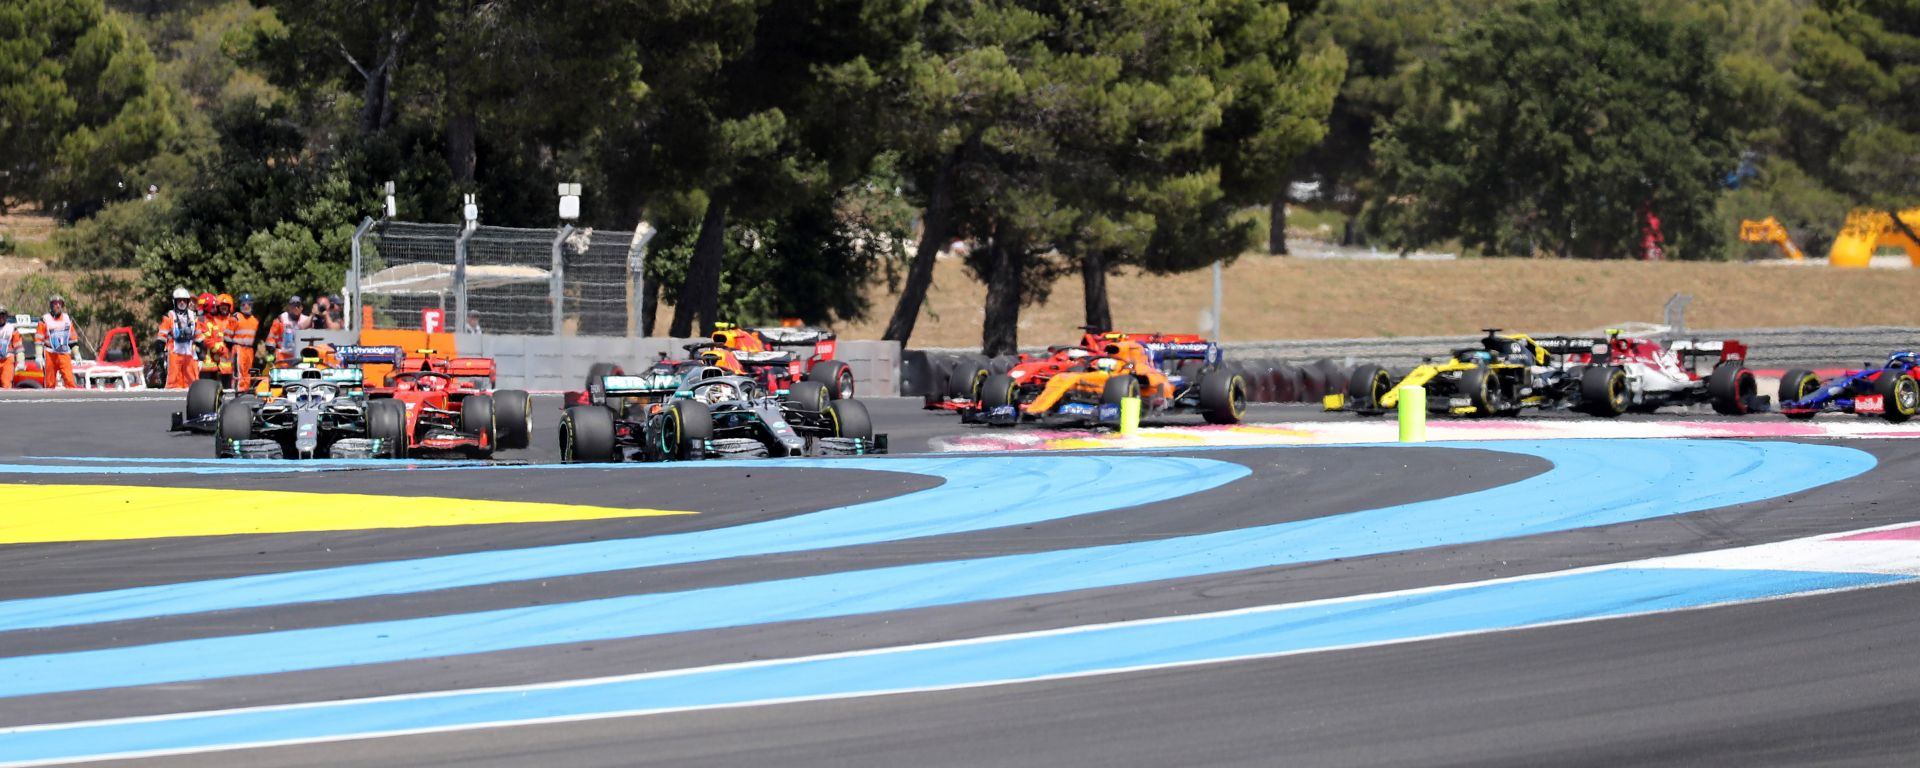 F1 GP Francia 2019, la partenza della gara